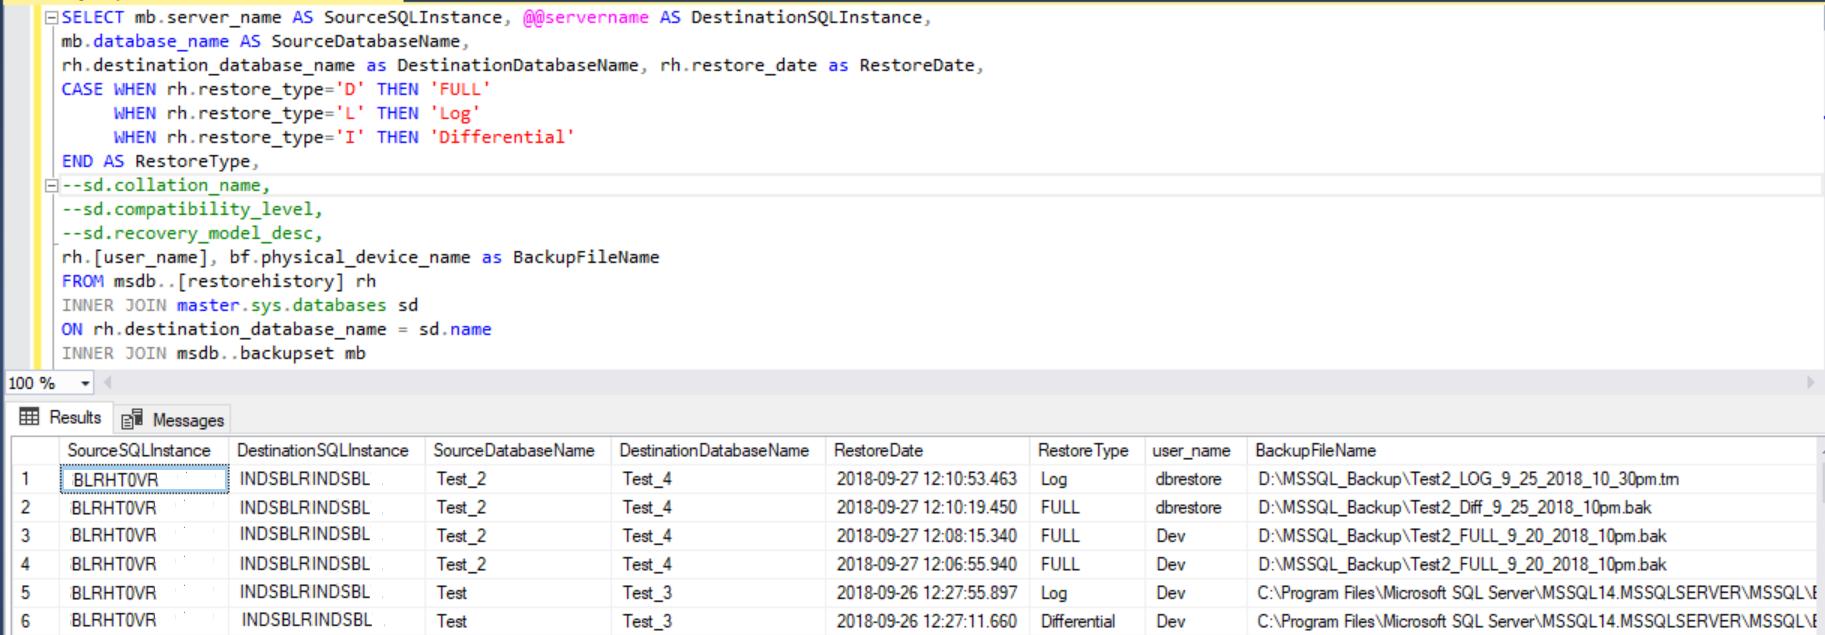 Script to provide database restore report